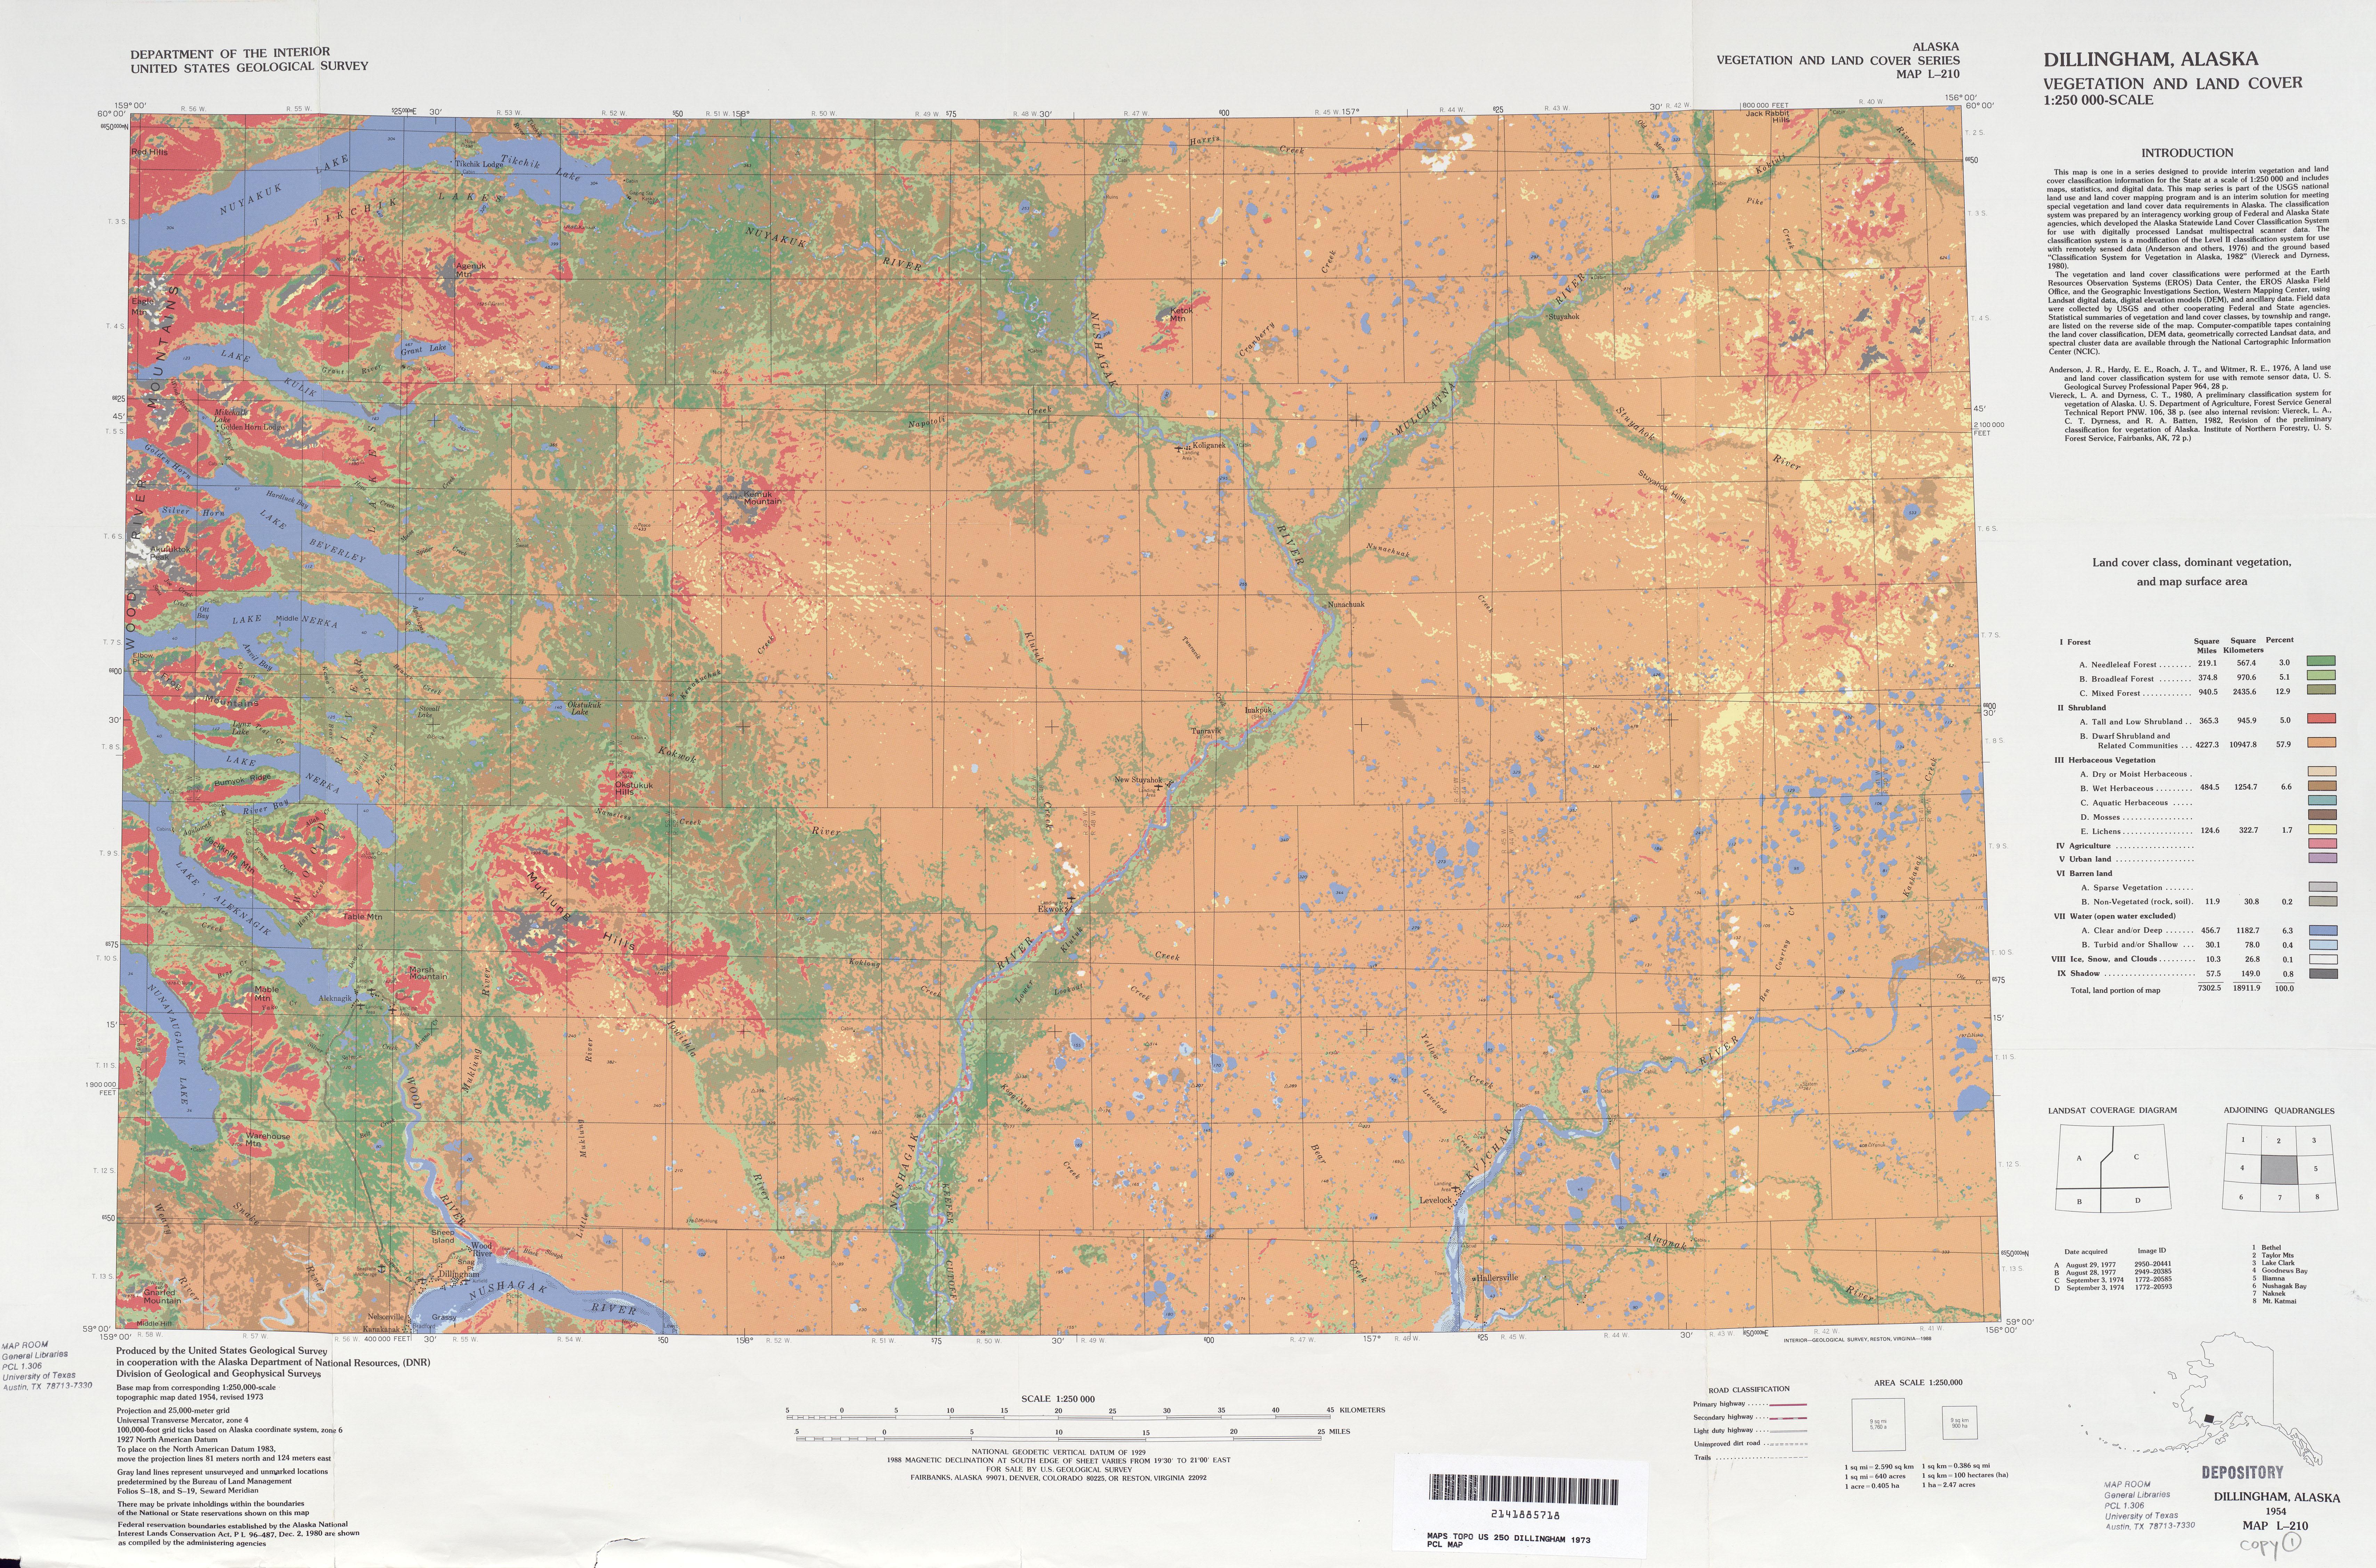 Dillingham Vegetation and Land Cover Map Sheet, United States 1973